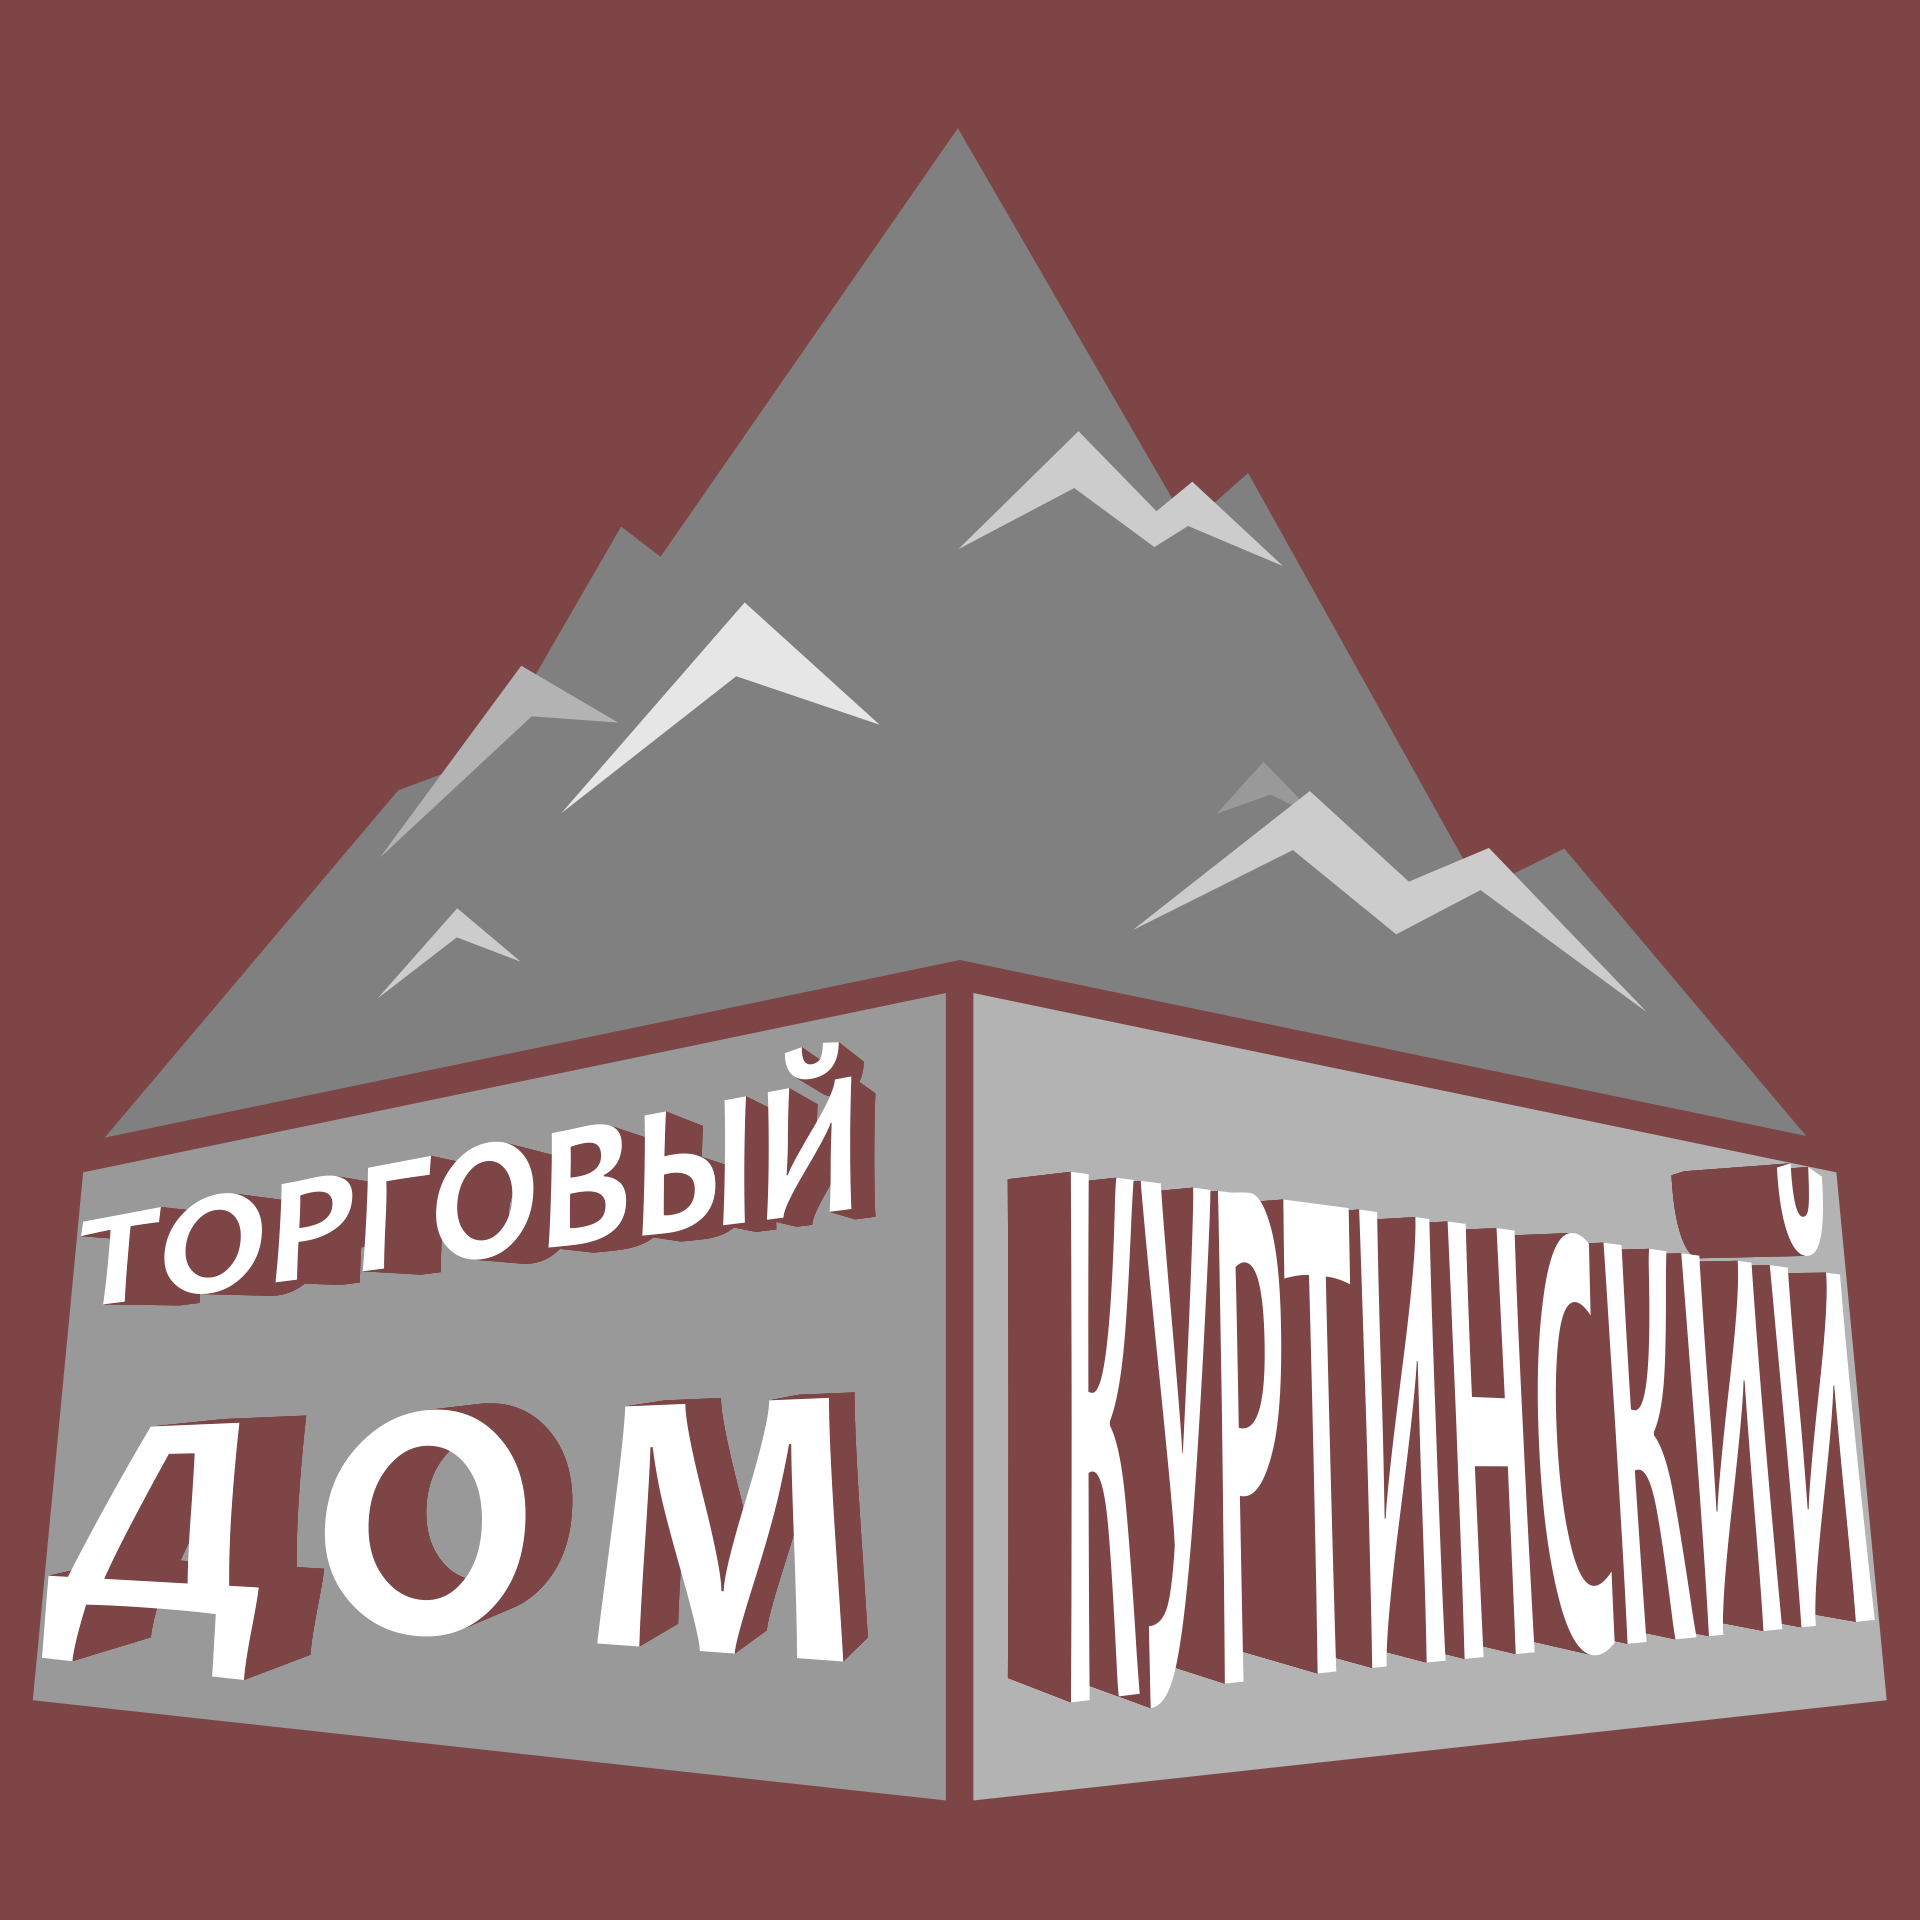 Логотип для камнедобывающей компании фото f_4515b9d5d6b5c389.jpg